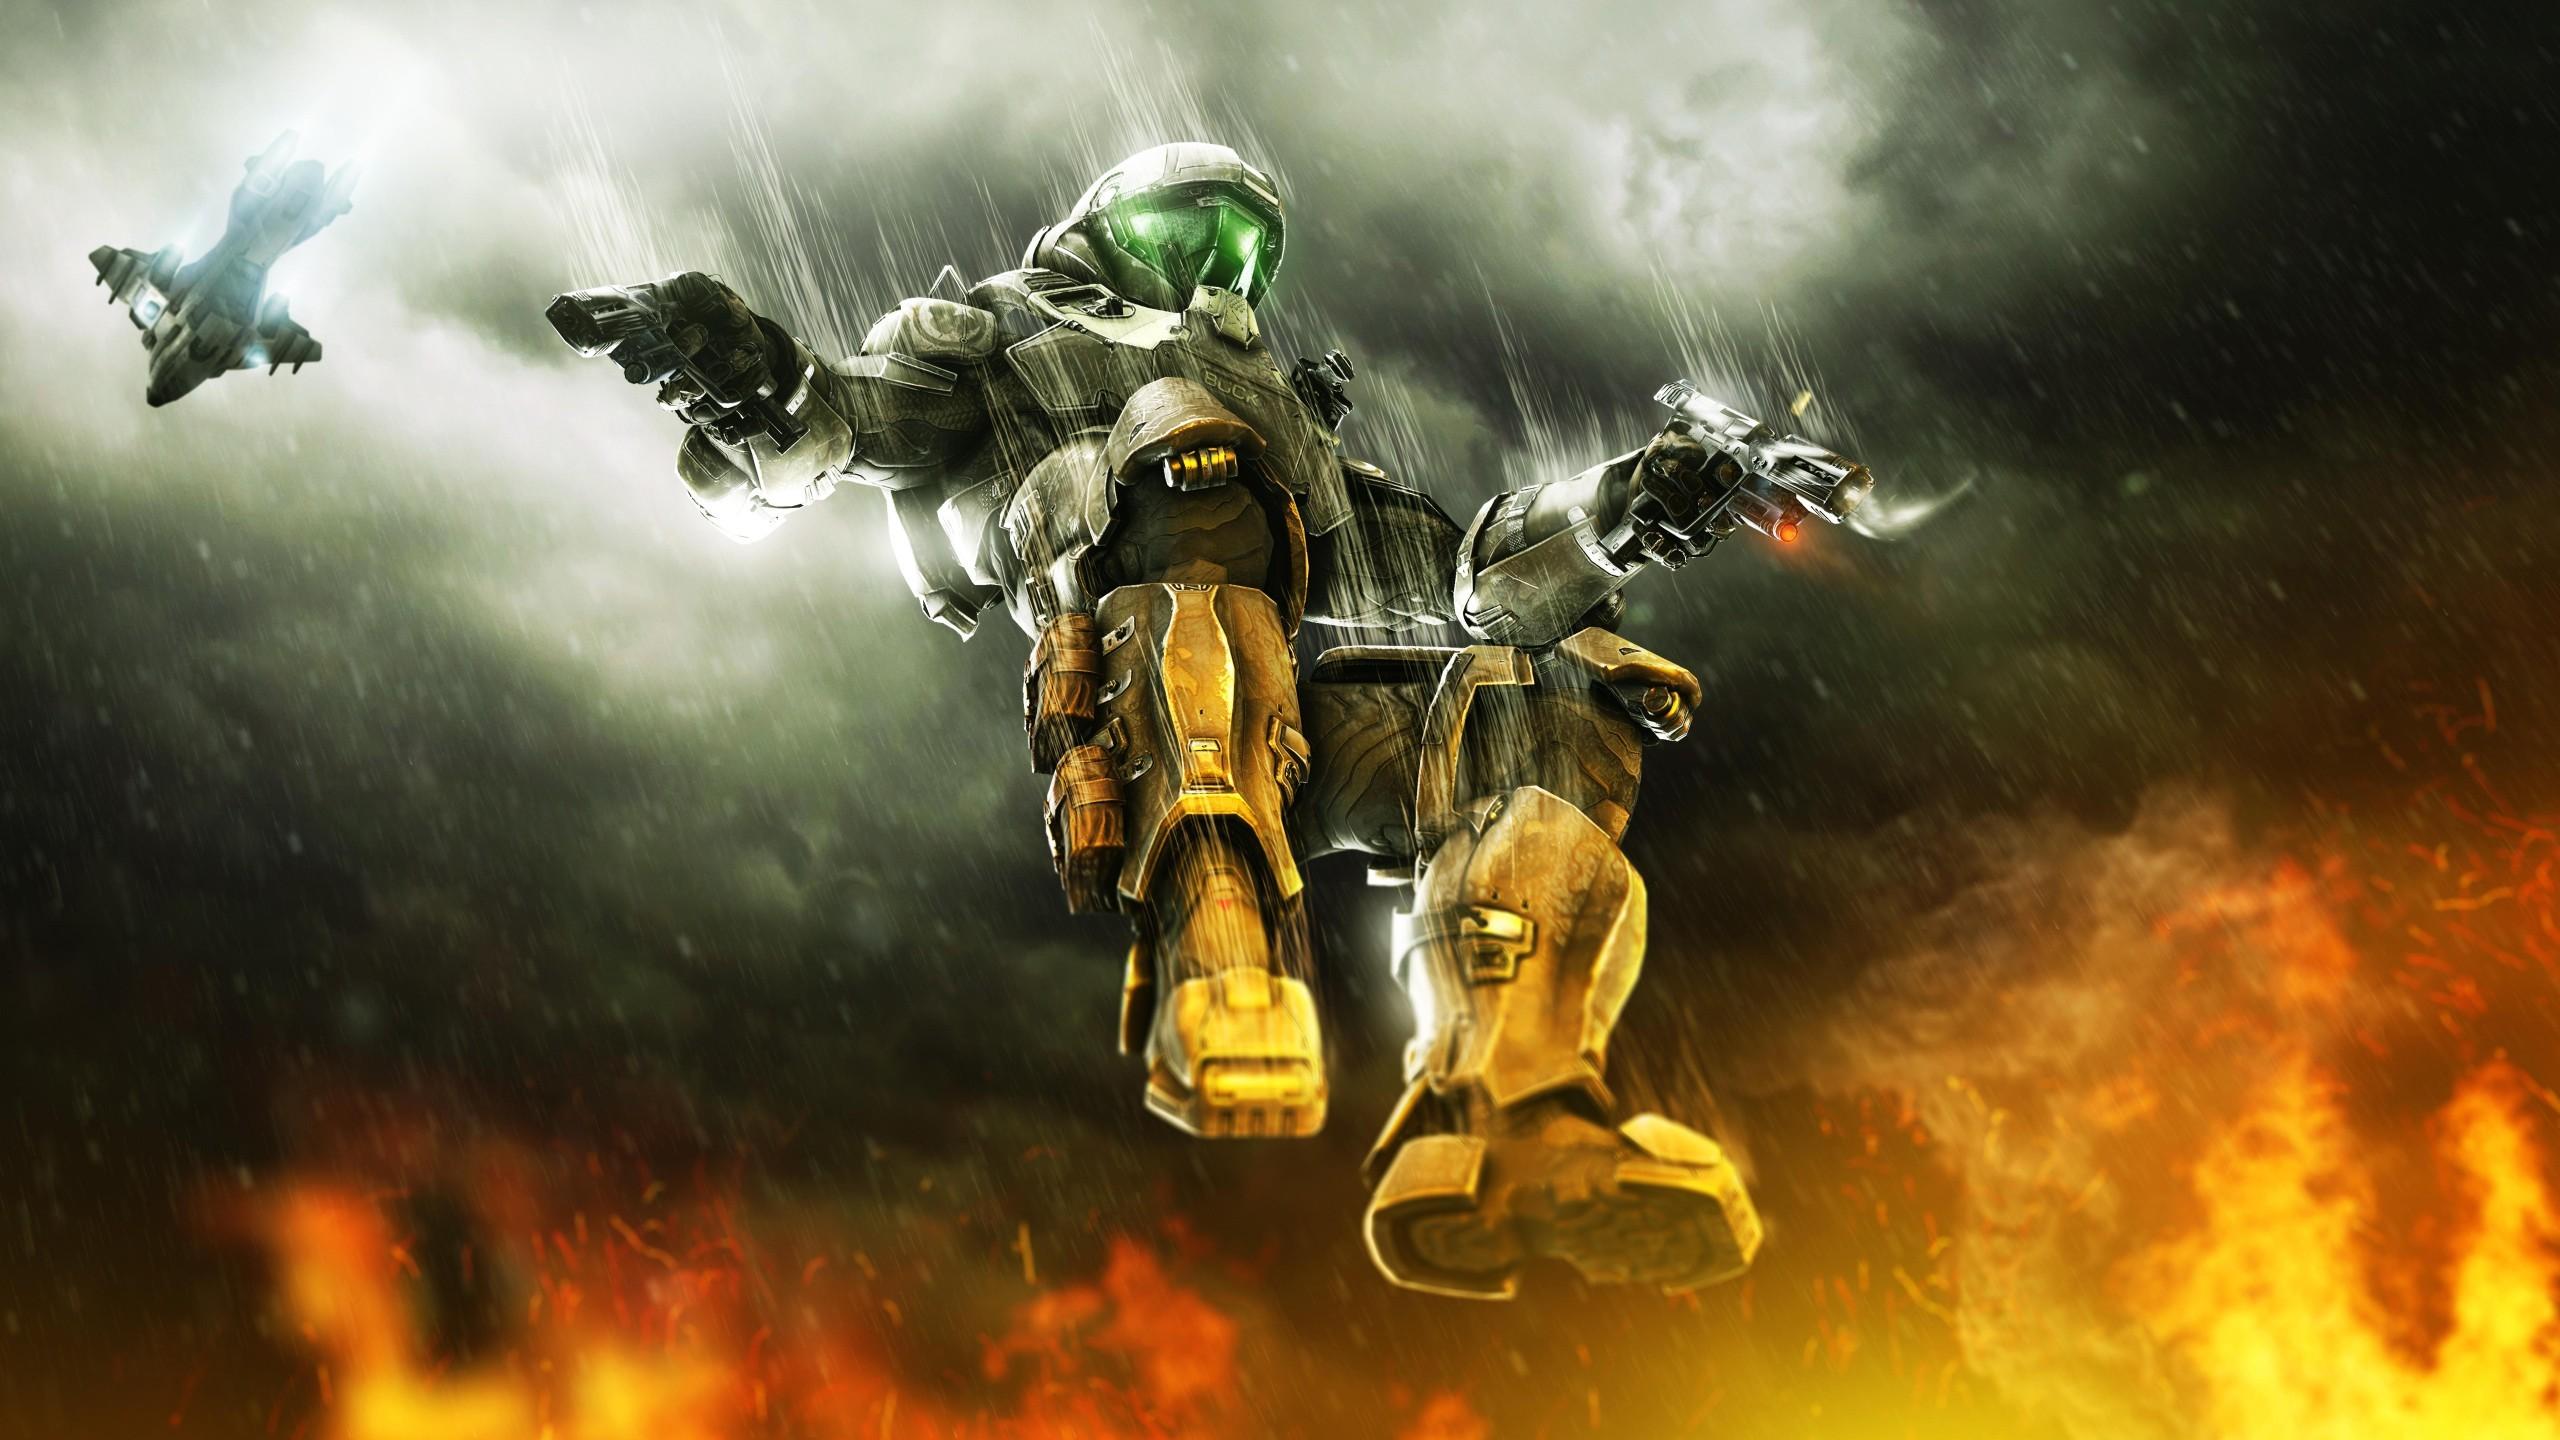 Halo 3 OSDT Artwork 4K 8K Wallpapers | HD Wallpapers